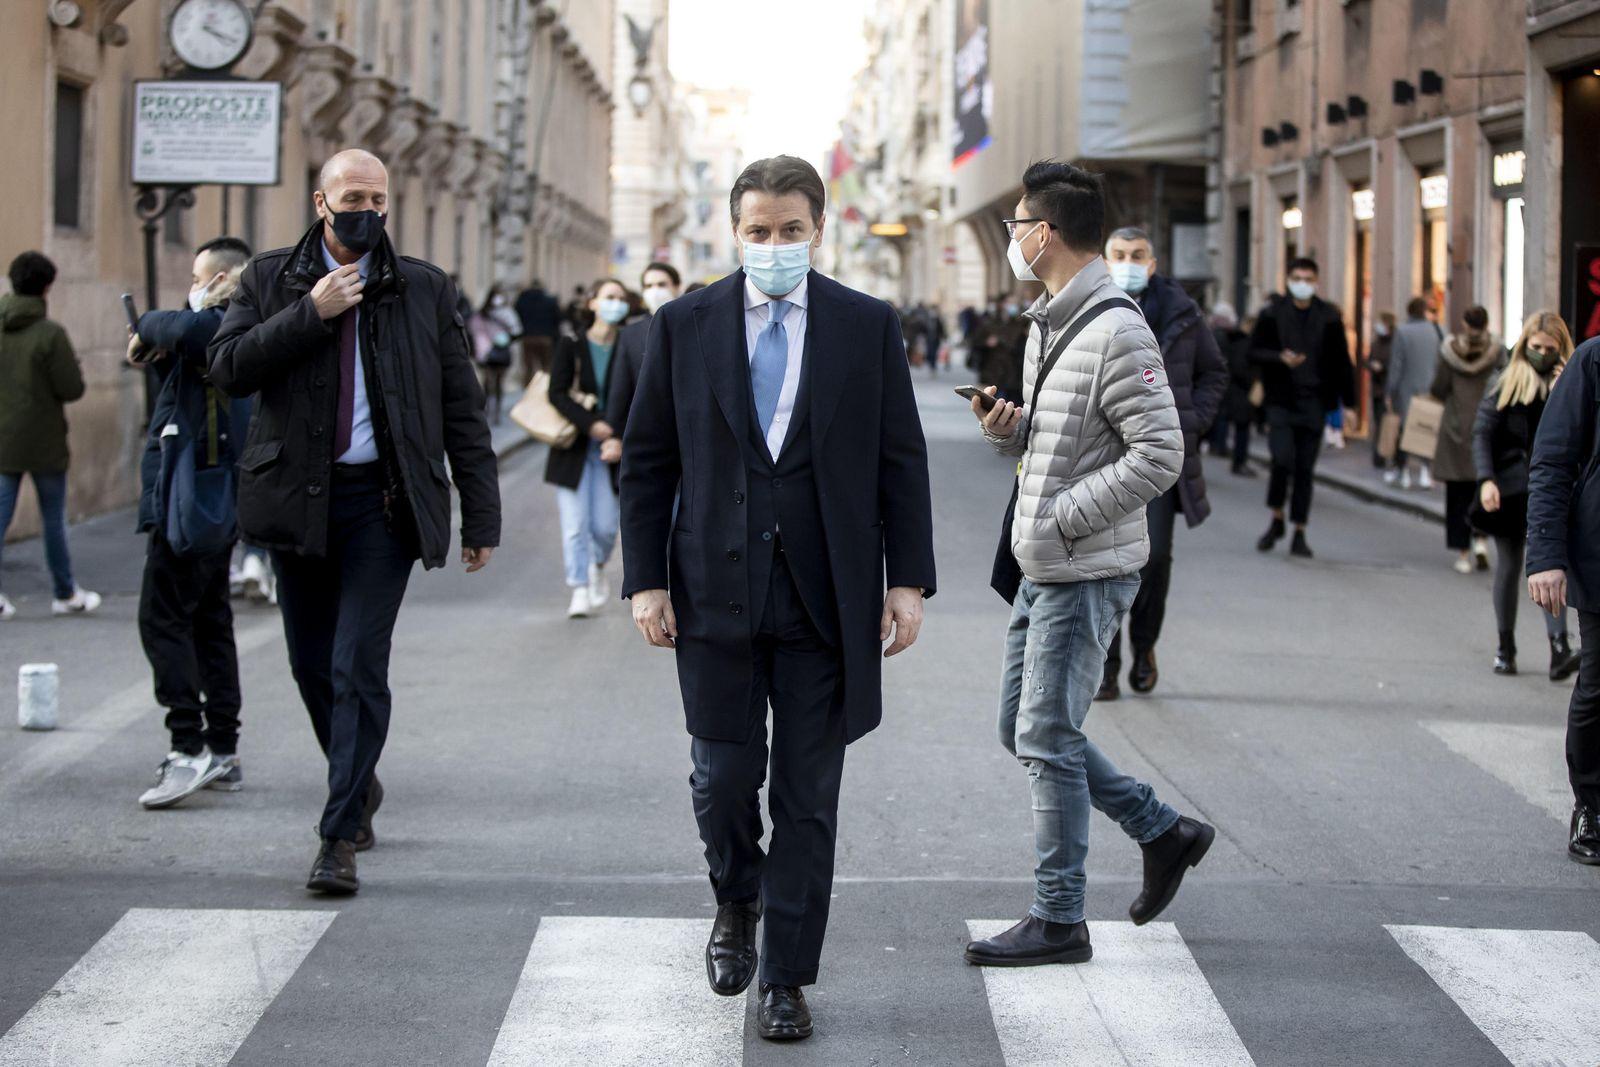 Italian Prime Minister Giuseppe Conte in Rome, Italy - 12 Jan 2021